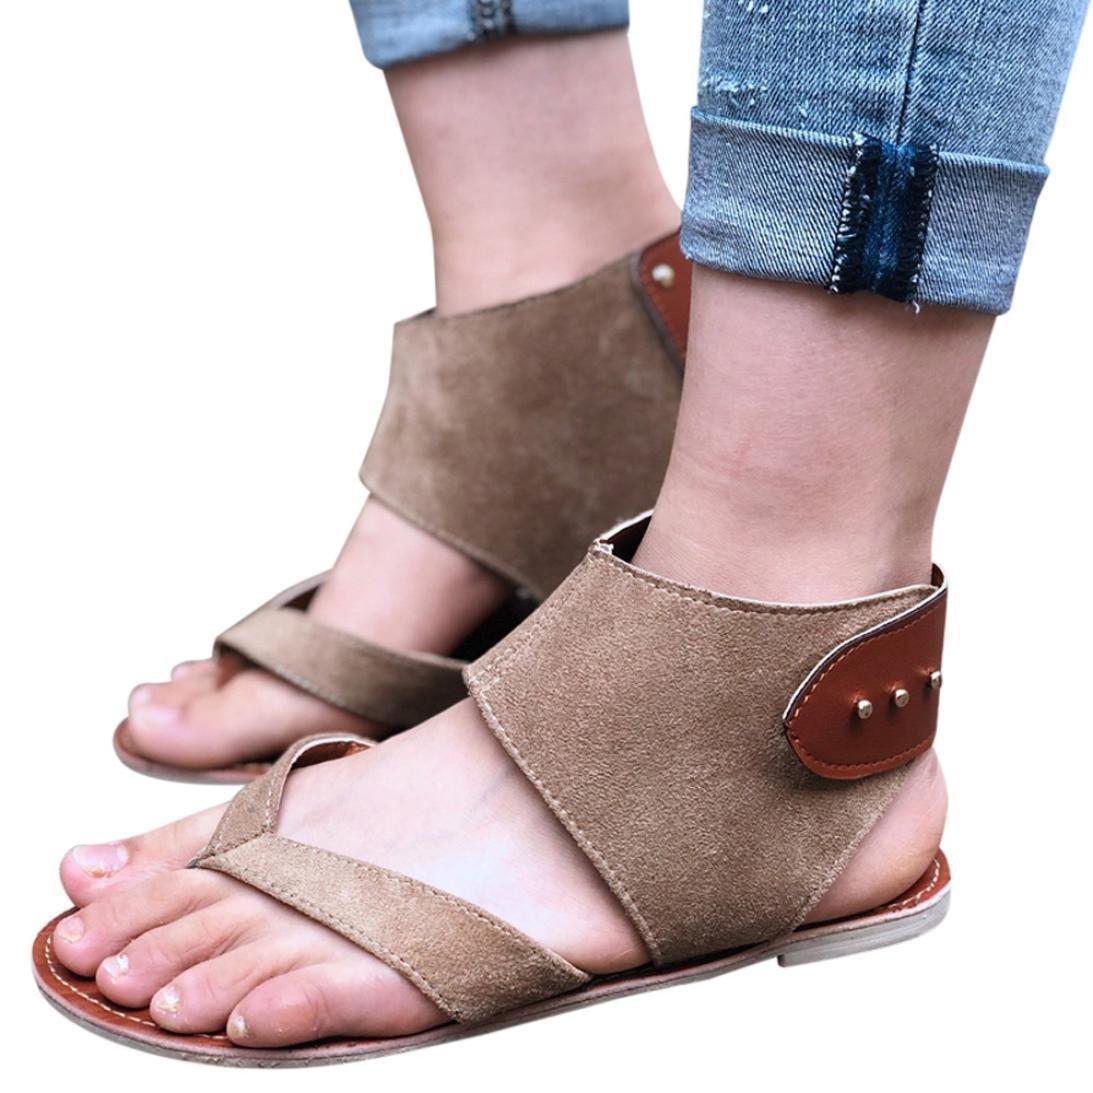 FORUU Summer Women Sandals Flats Fashion Shoes Casual Rome Style Sandals Casual (39, Khaki)